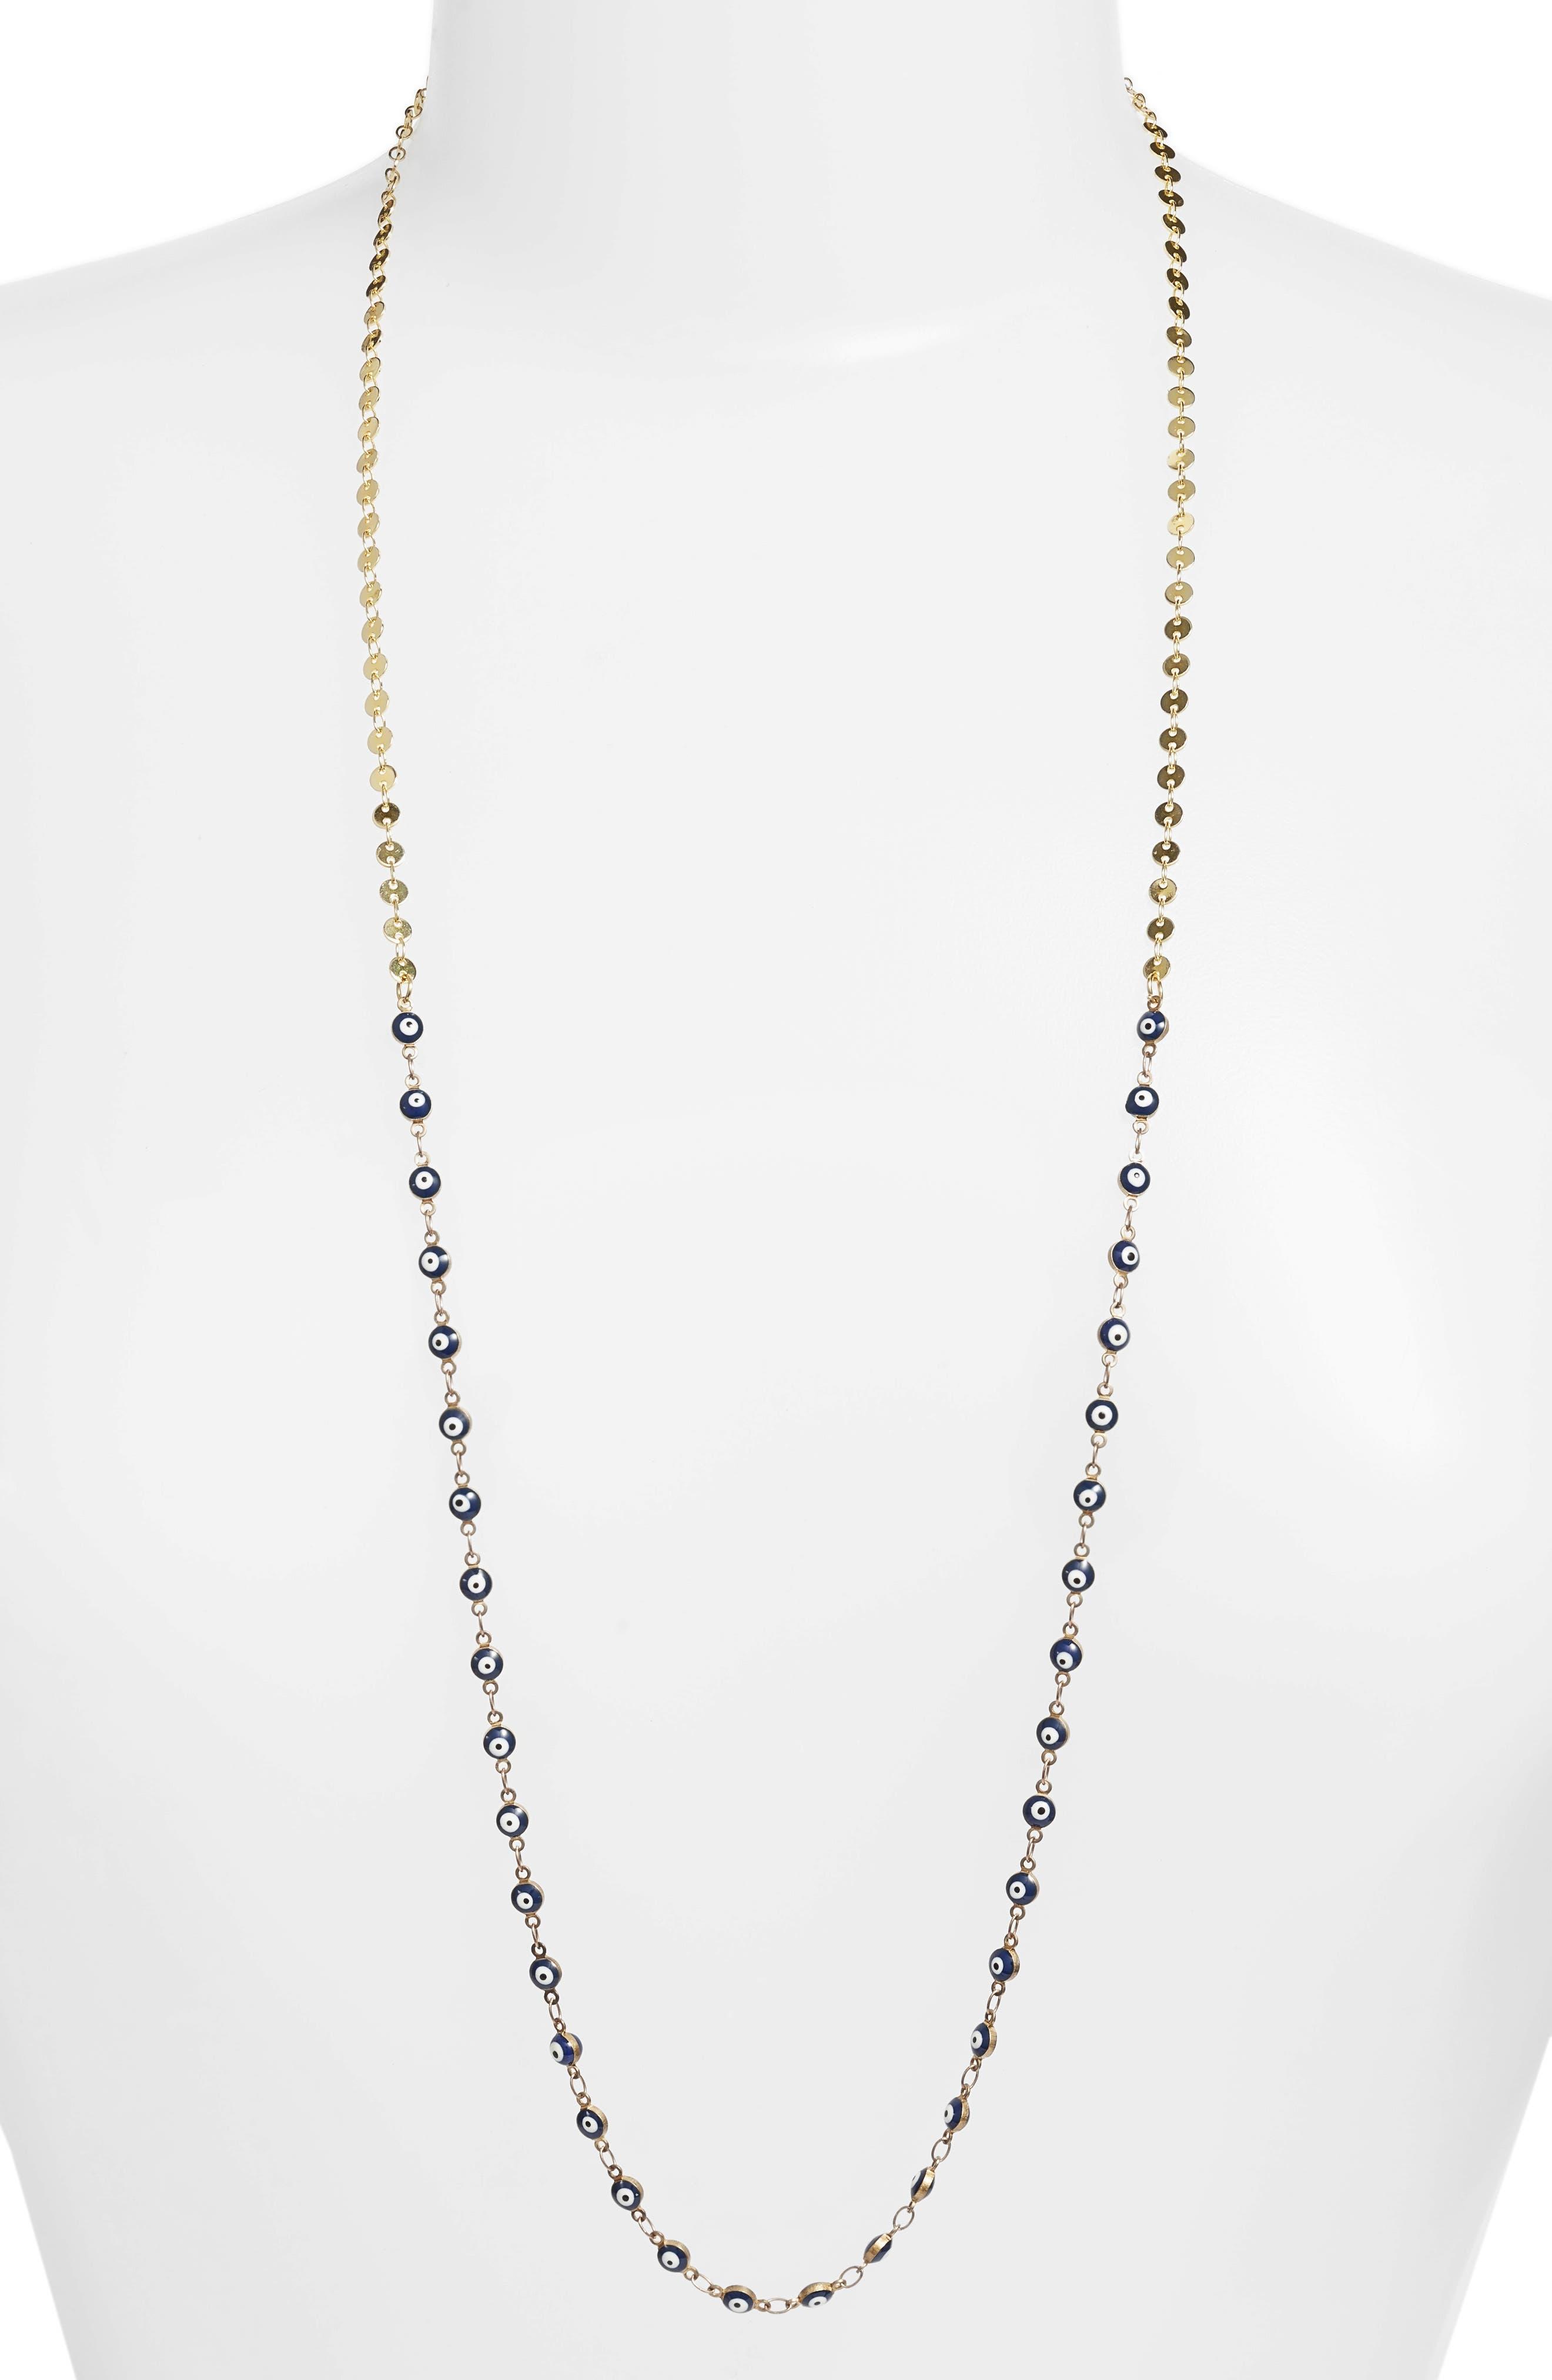 Mad Jewels Abundance Necklace